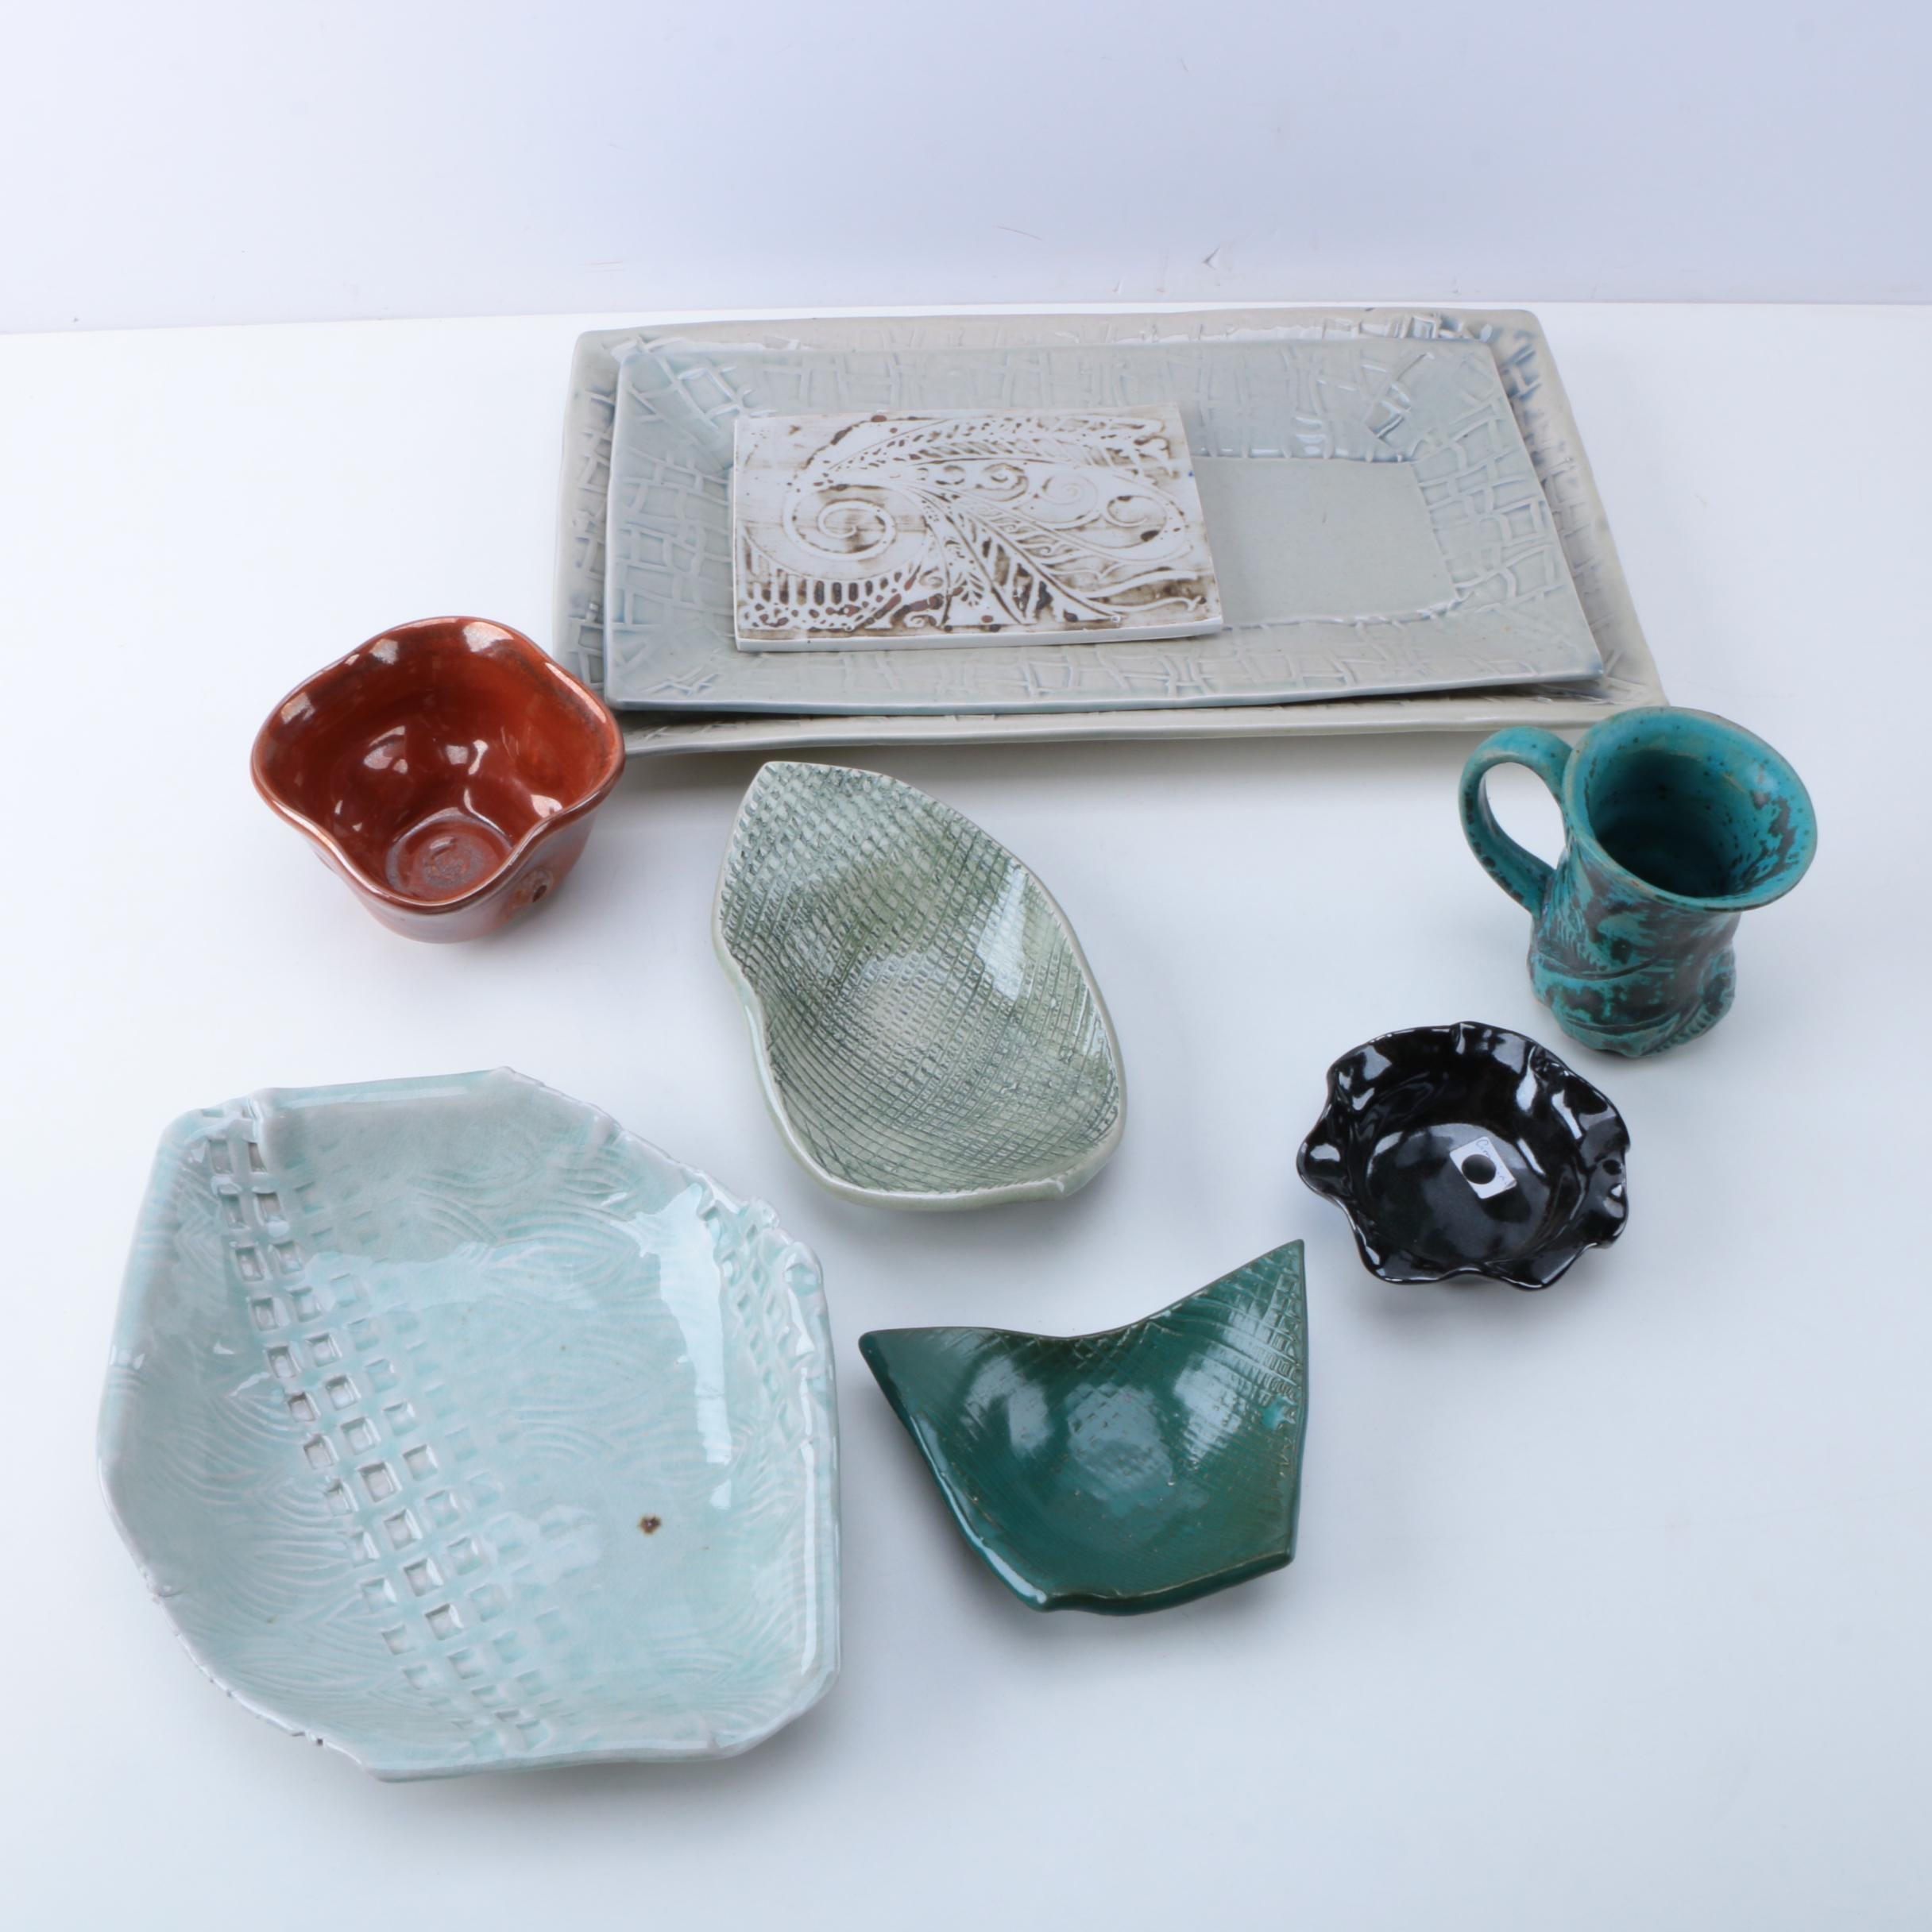 Handbuilt and Thrown Stoneware Tableware by Cimmino